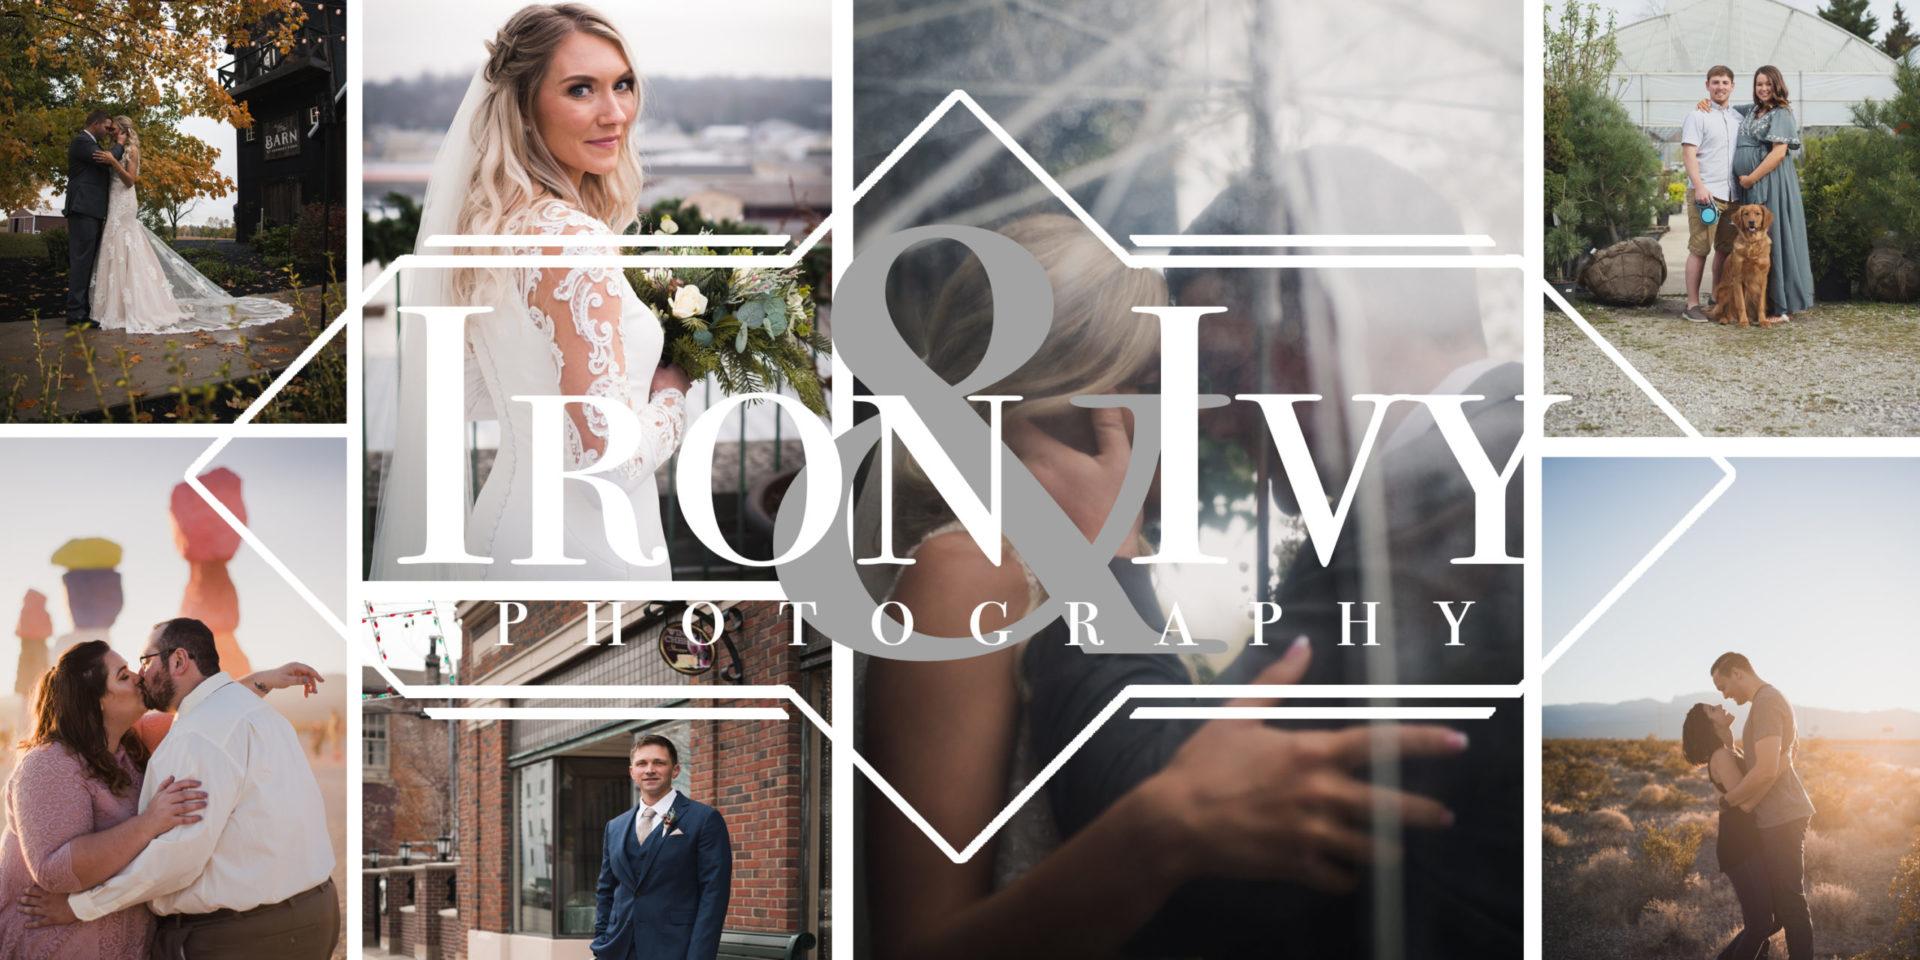 Iron & Ivy Photography